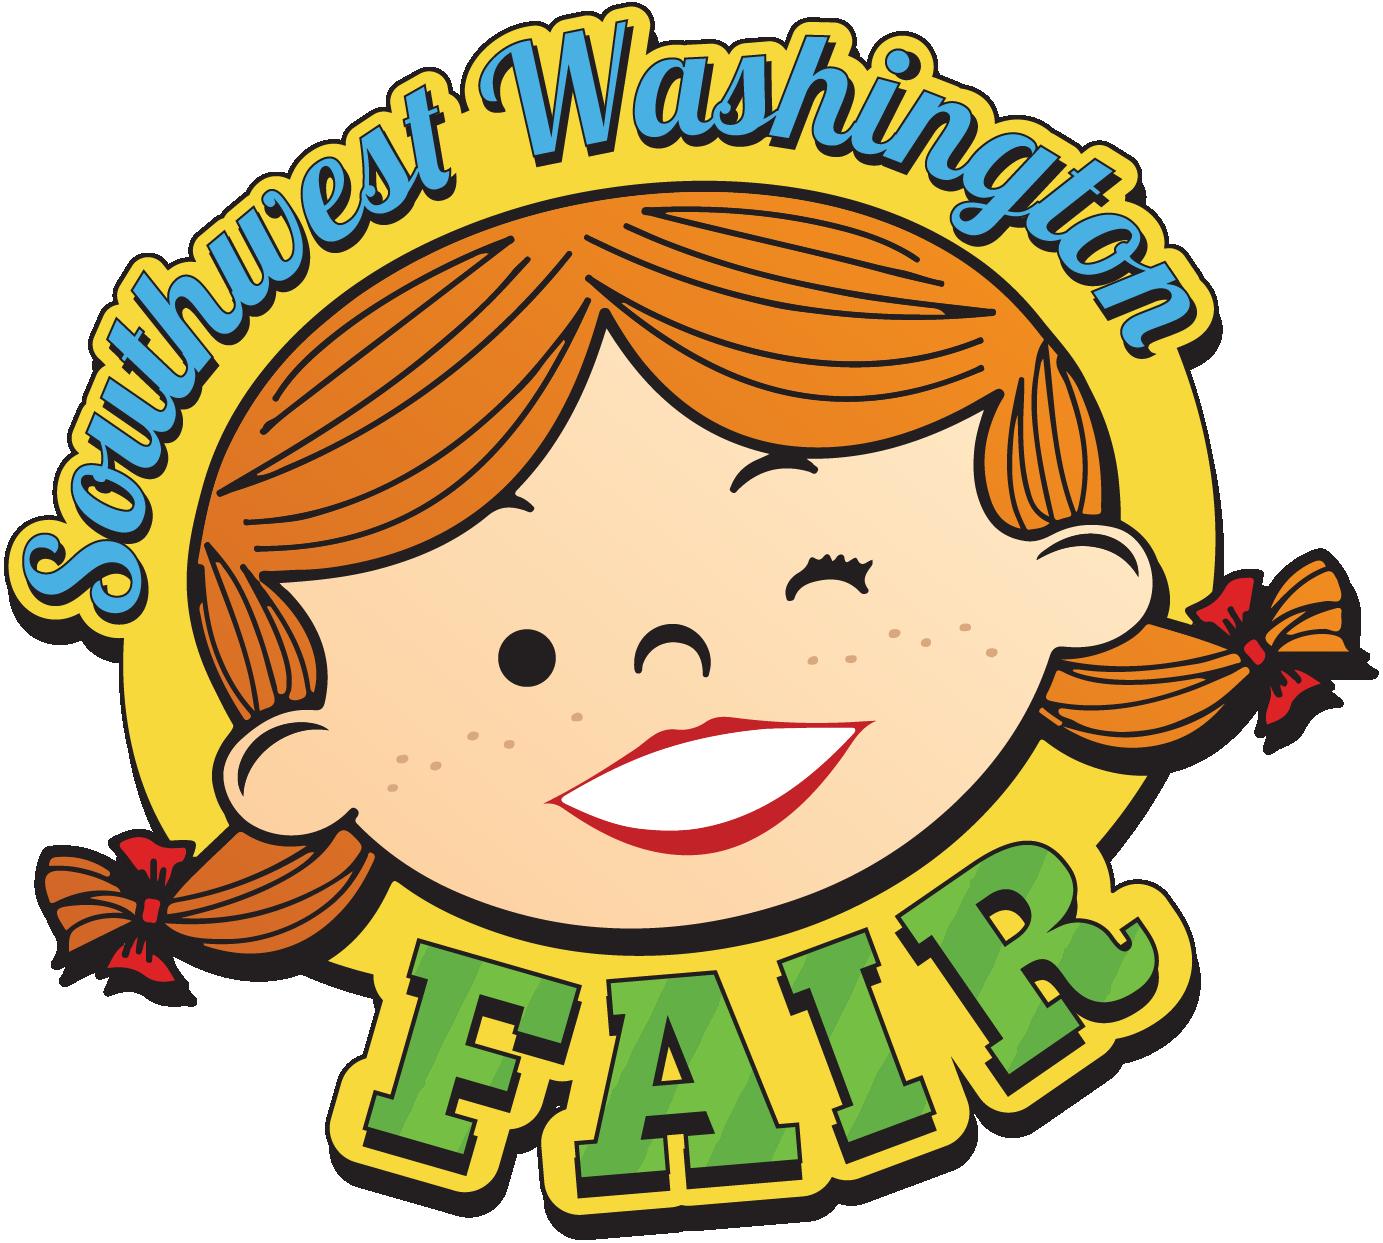 Fair clipart fairground. Southwest washington at centralia